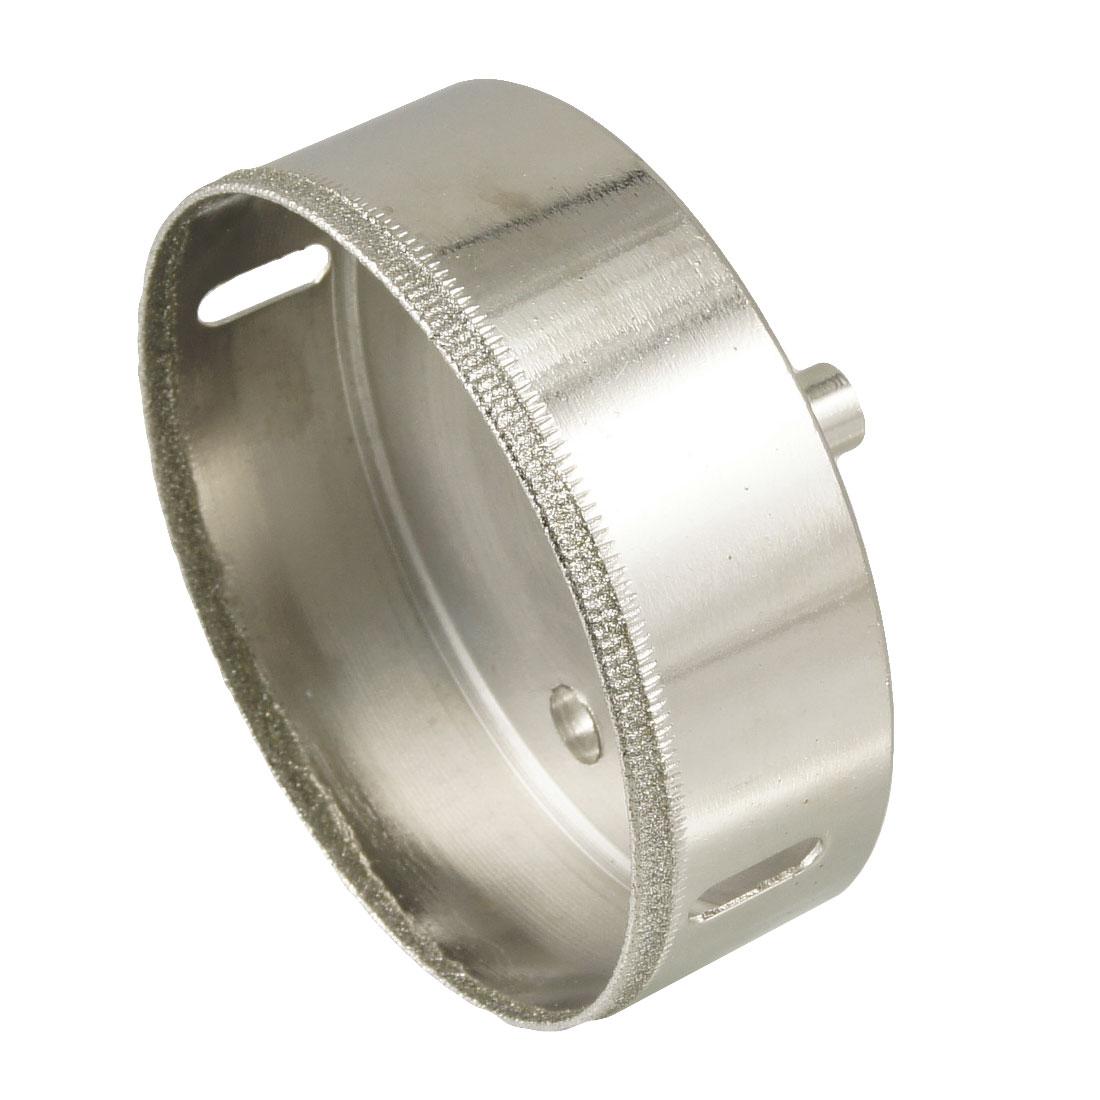 90mm Diameter Hole Saw Drill Bit Cutter for Glass Ceramic Tile